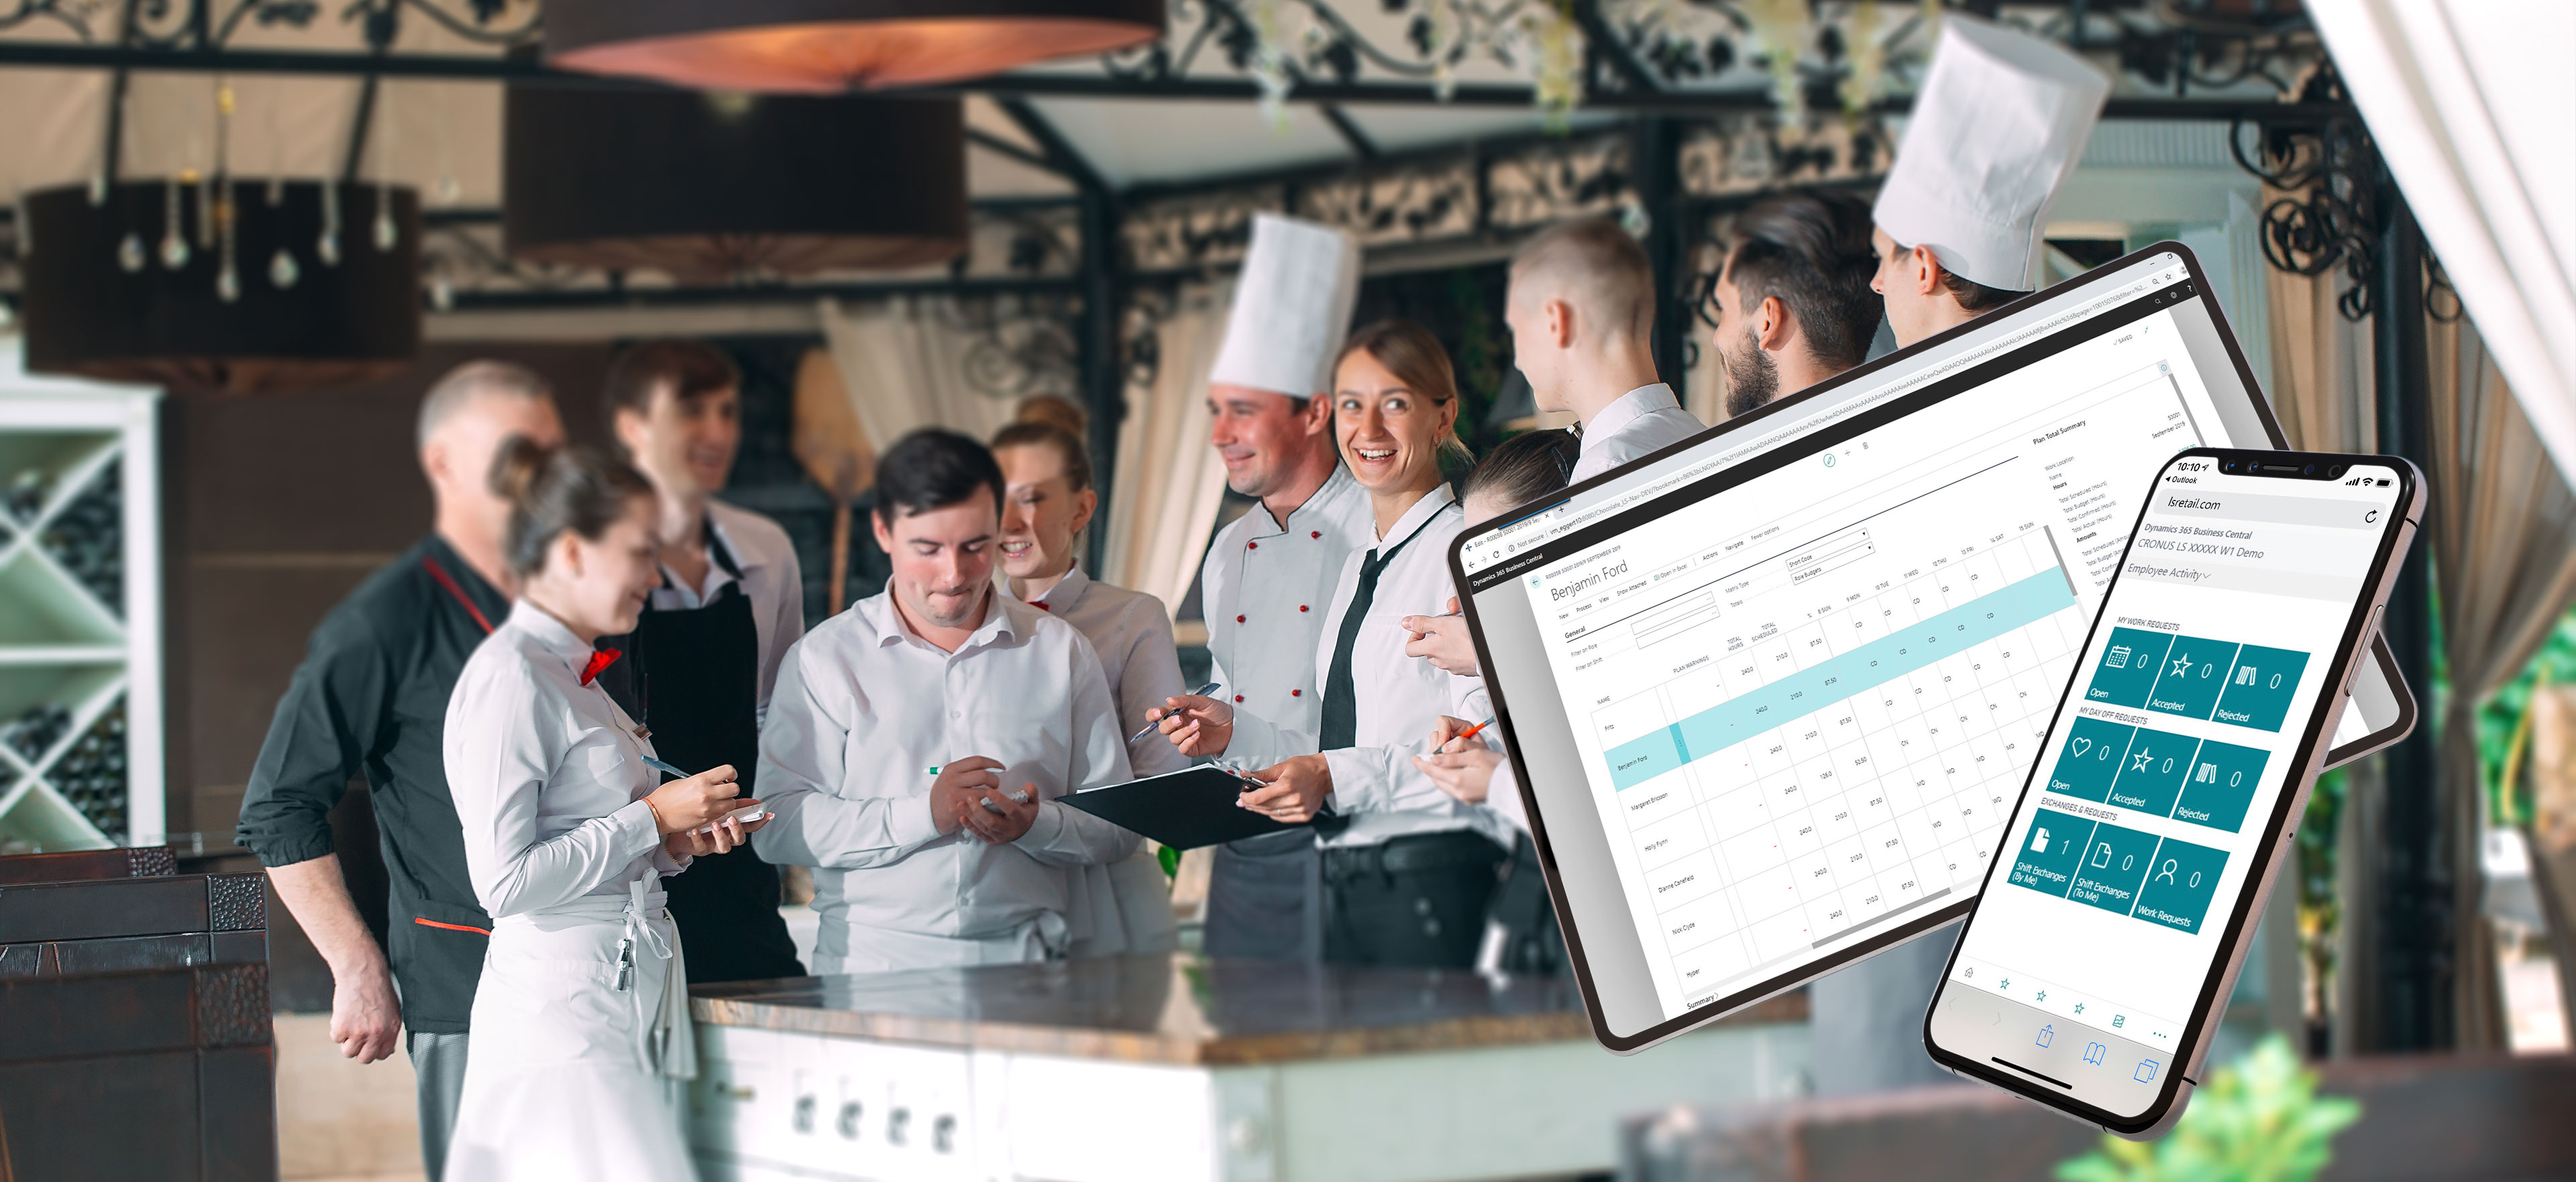 LS-Central-for-restaurants-Staff-management-header